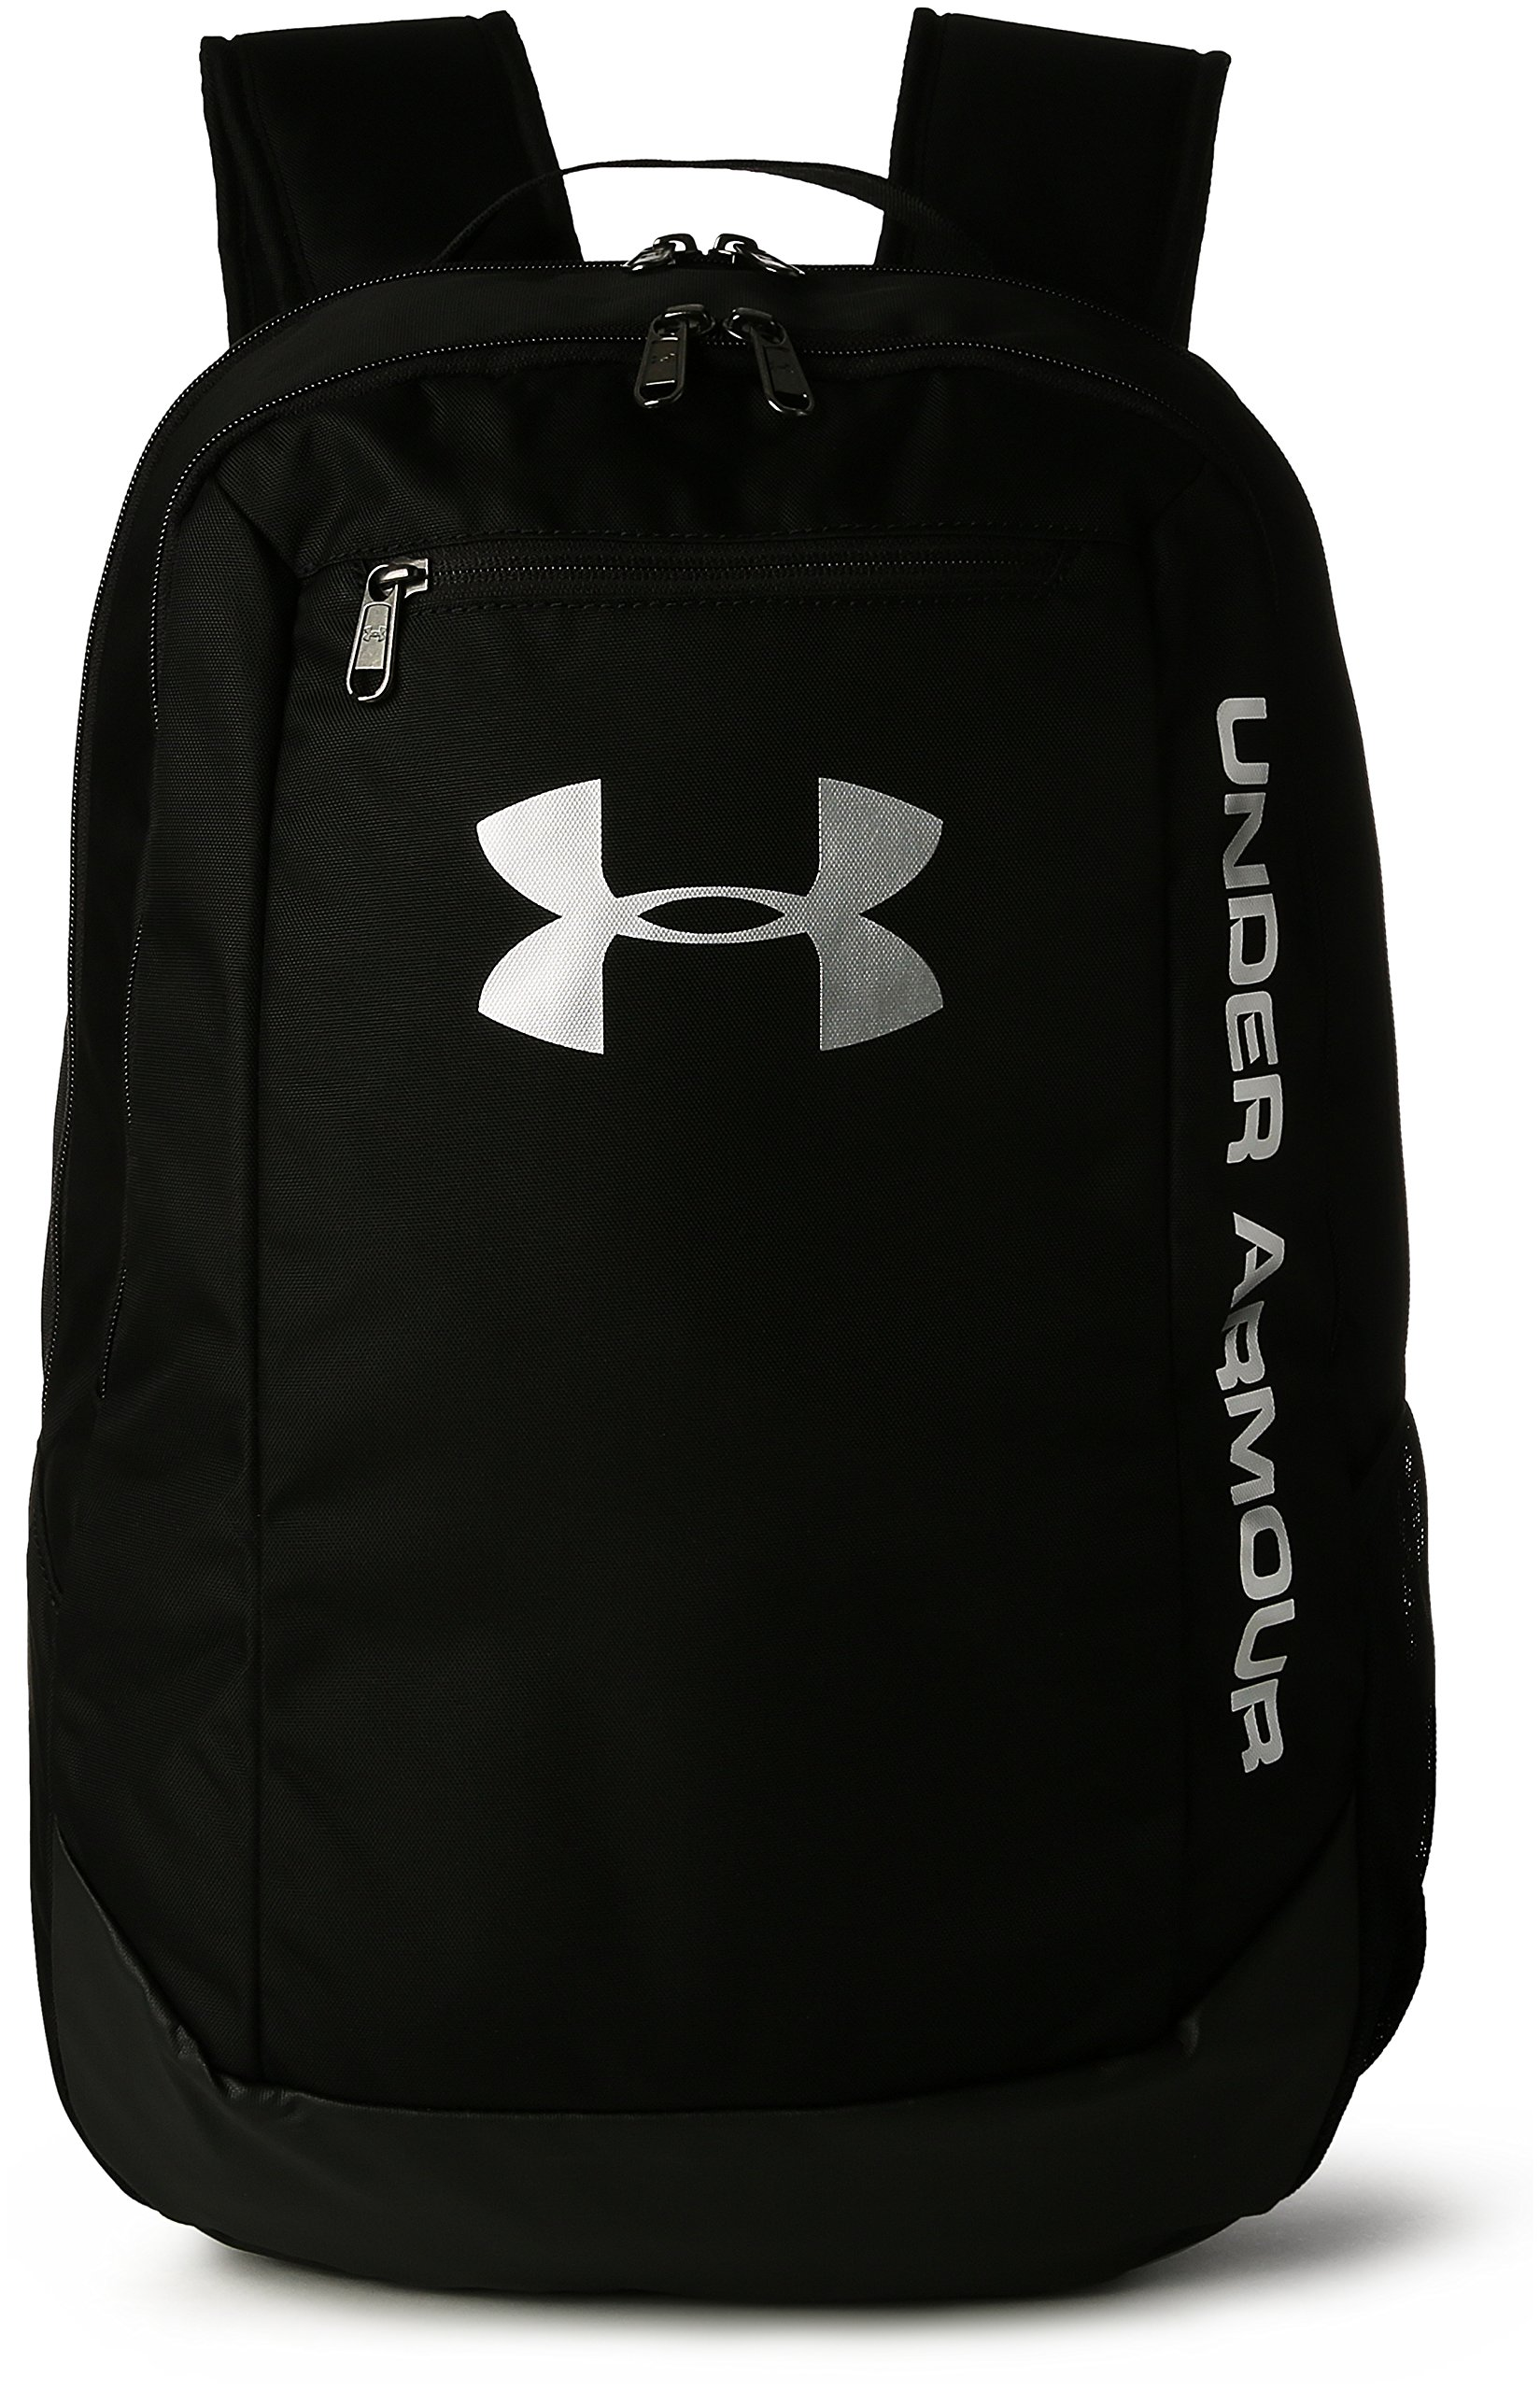 Under Armour UA Hustle Backpack Ldwr Mochila, Hombre, Negro Black/Silver 001, Talla única